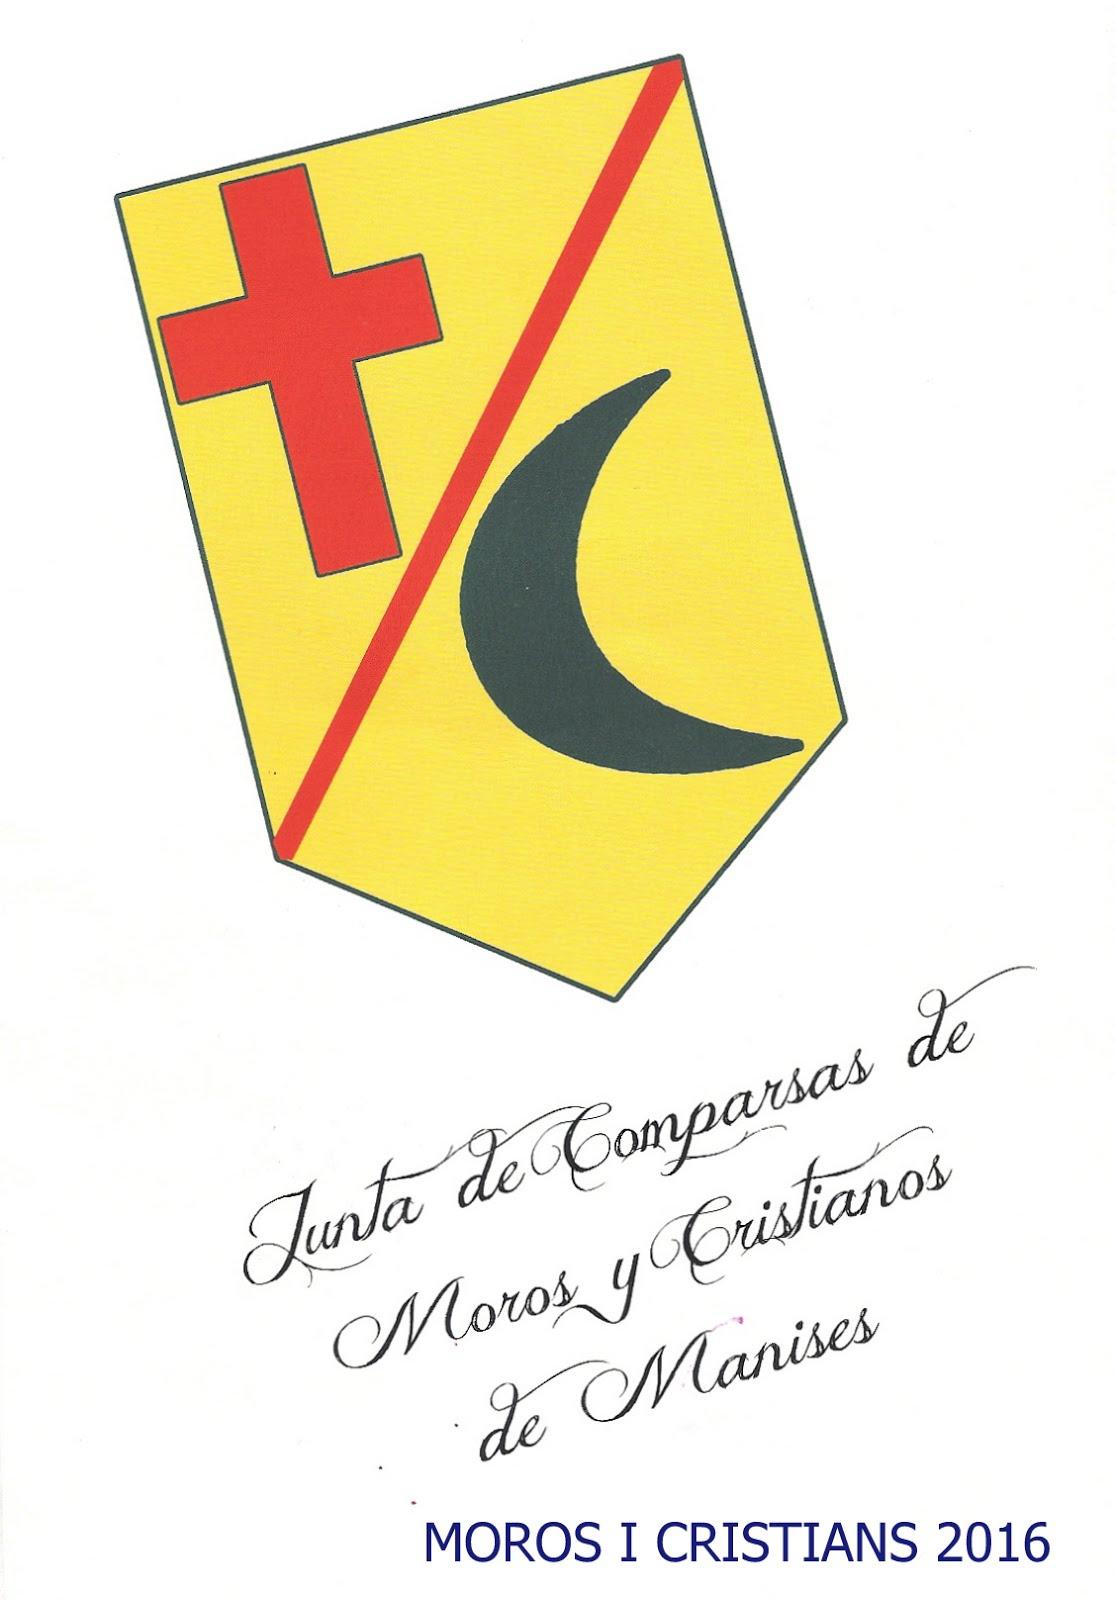 05.07.16 MOROS I CRISTIANS, COMPARSAS DE MANISES.